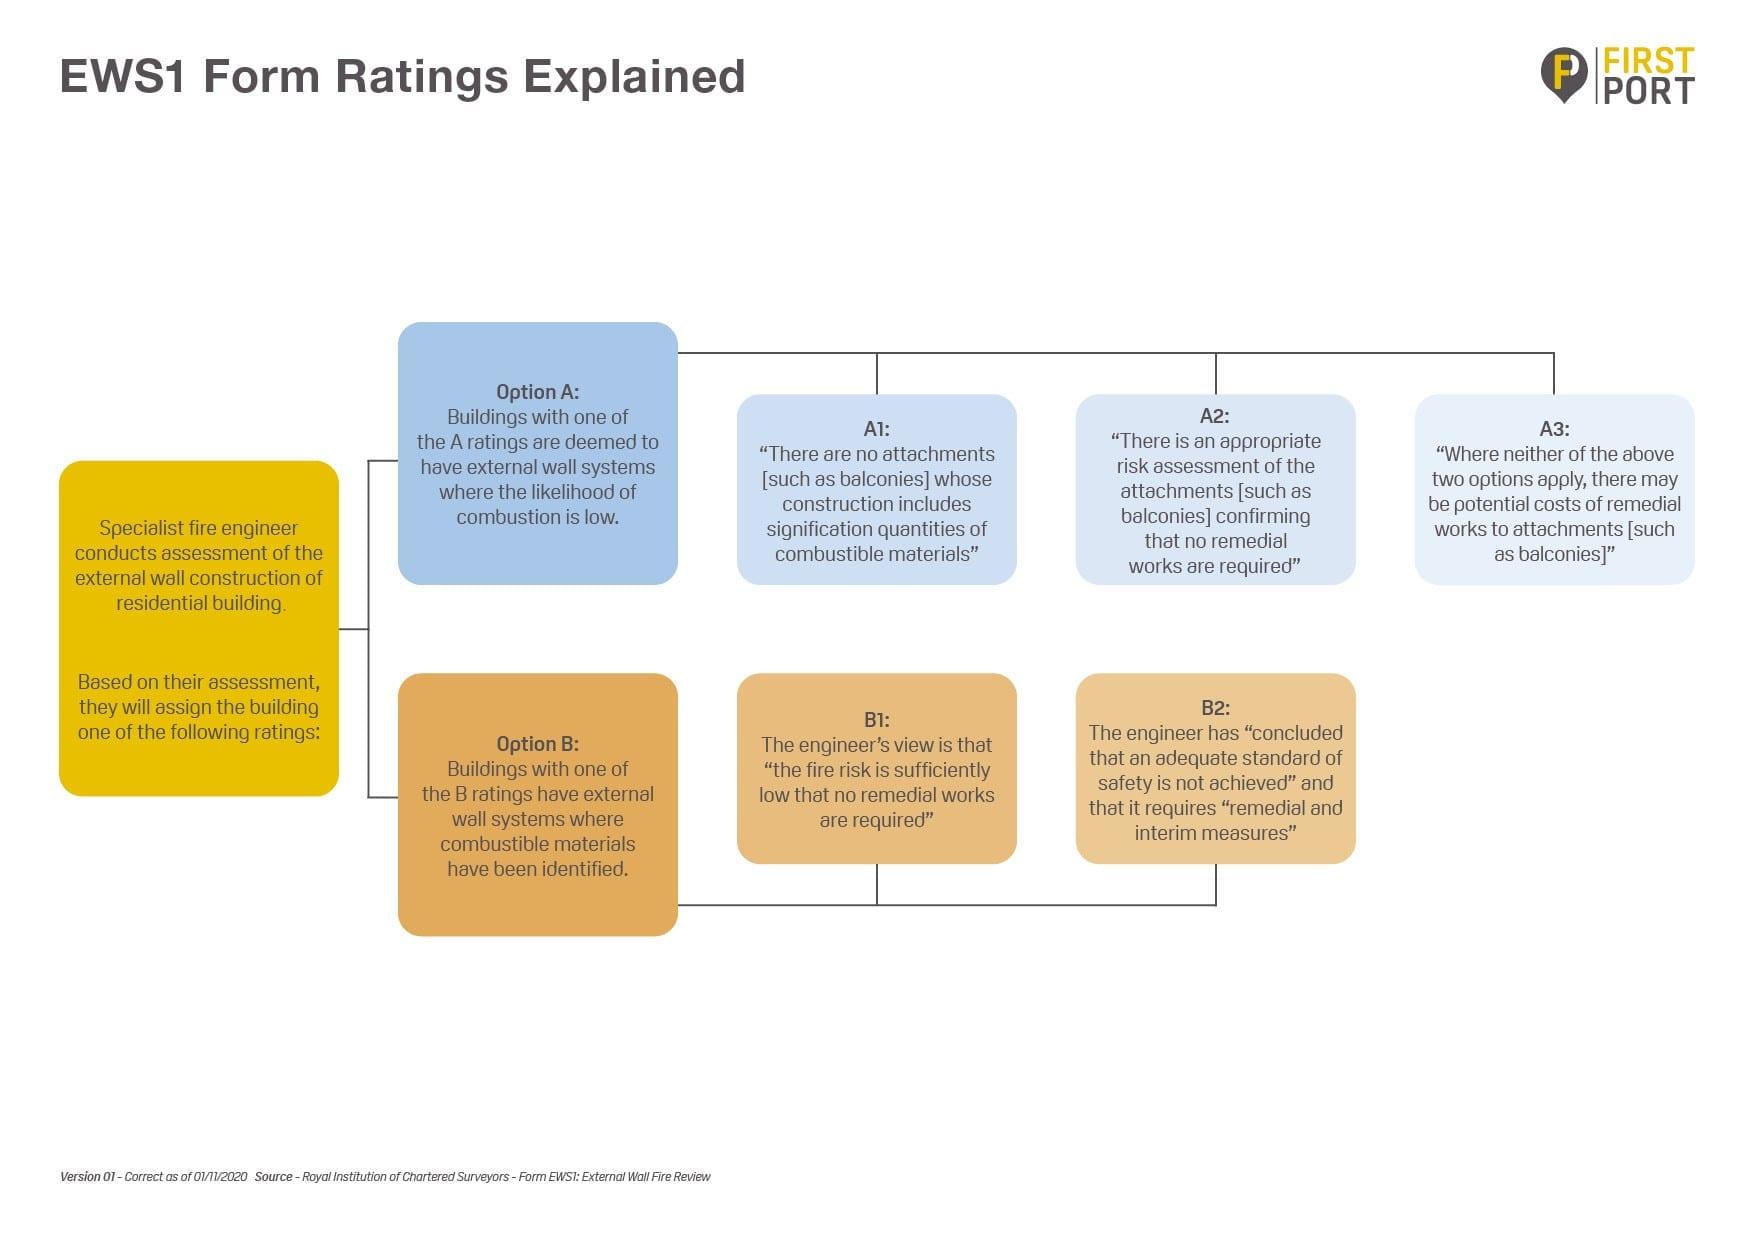 EWS1 Form rating explained flow chart